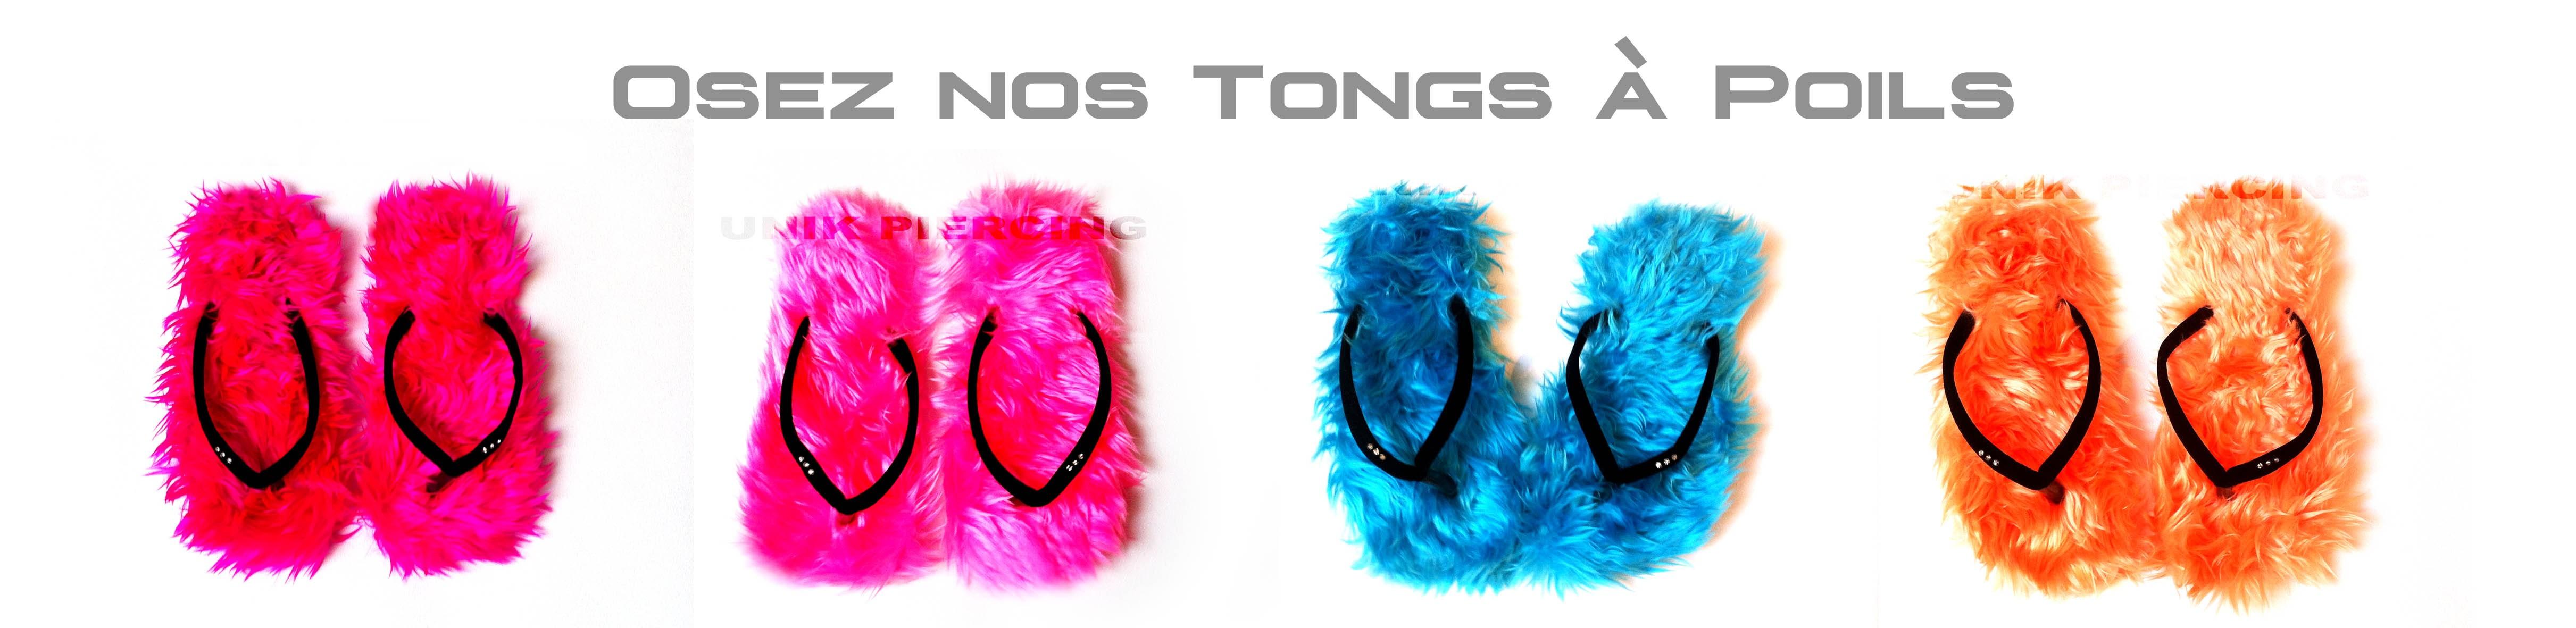 Tongs à Poils